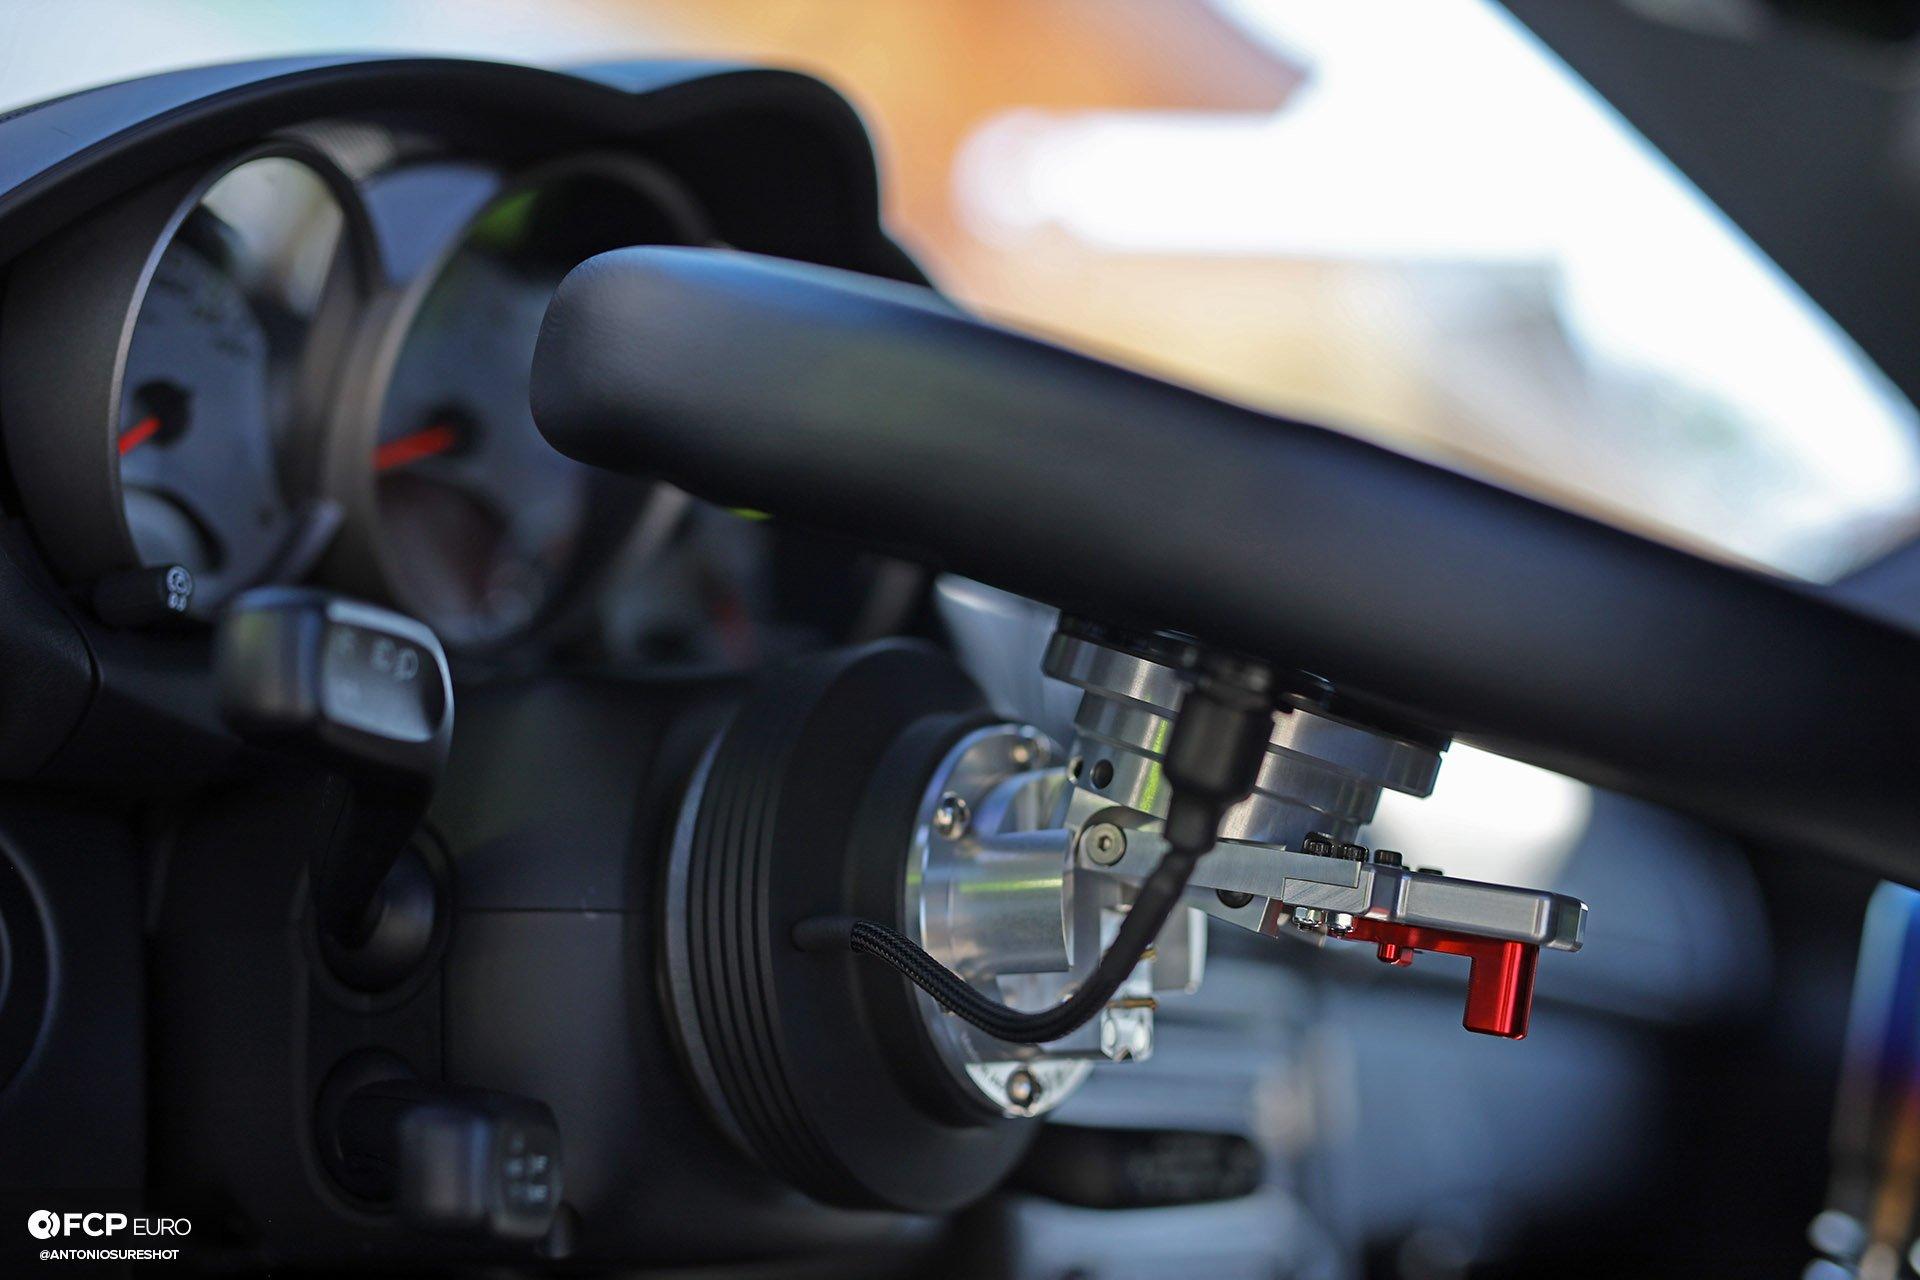 Works Bell hub Pandem Widebody Porsche Cayman S Toyo Tires Moton Suspension Work Meister Tarett Brembo Voltex Recaro Dionne Mascunana